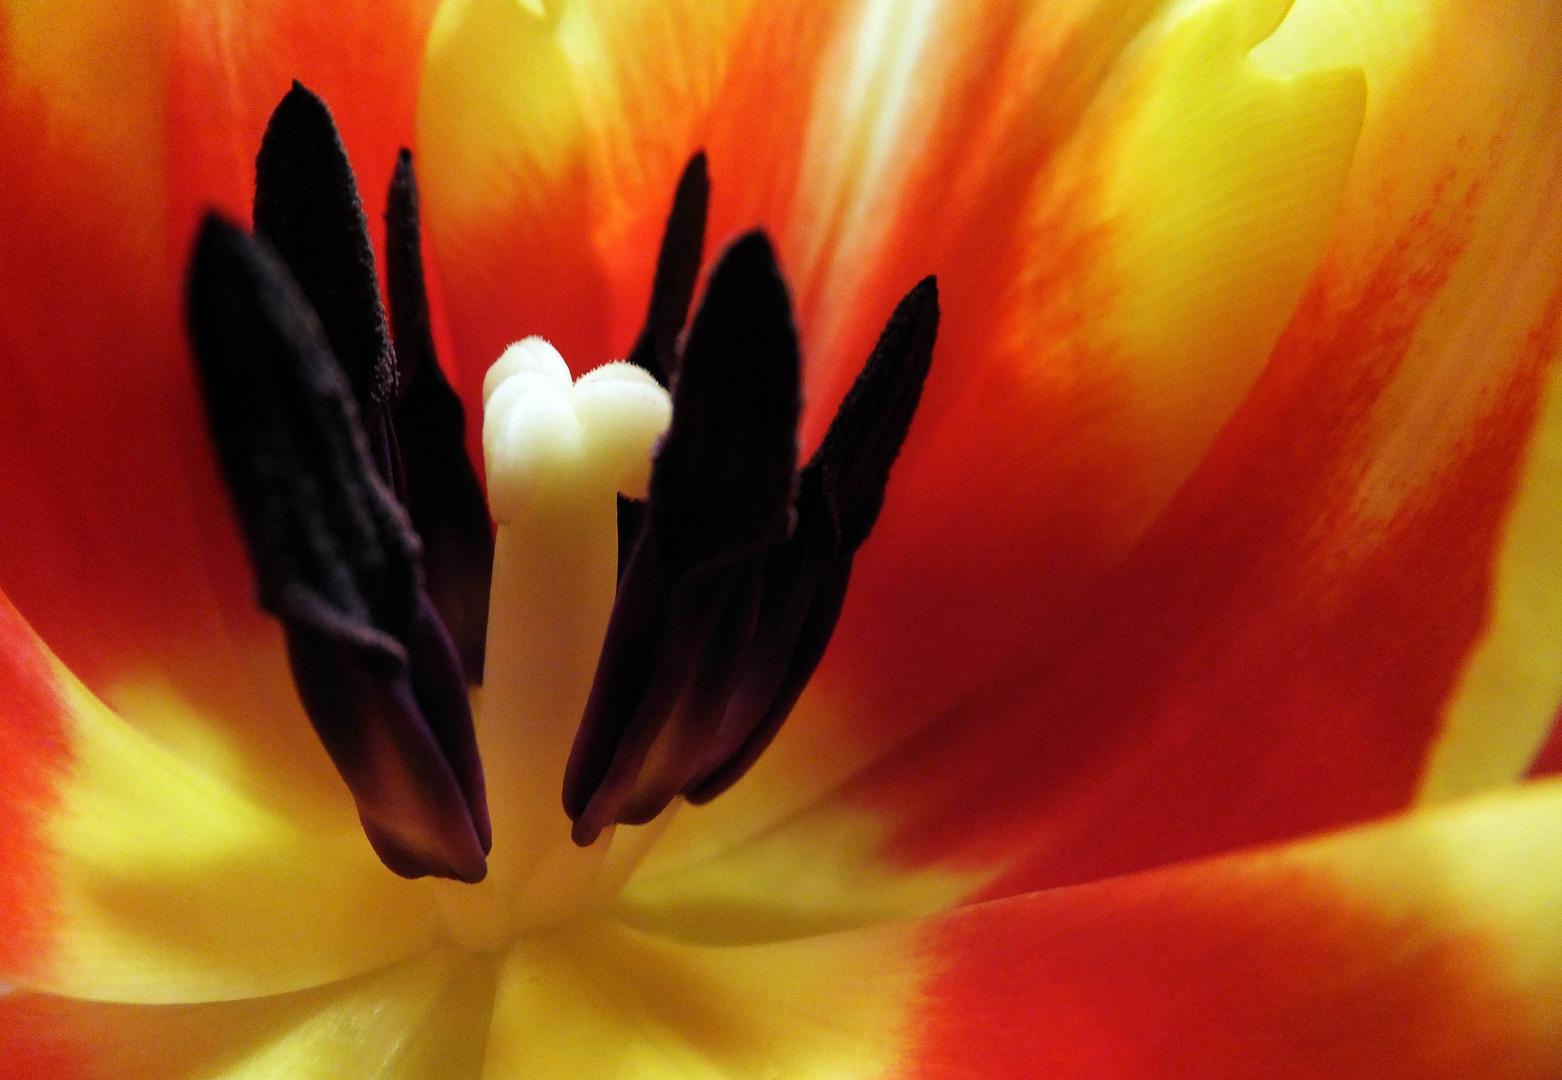 Der ultimative Tulipblick